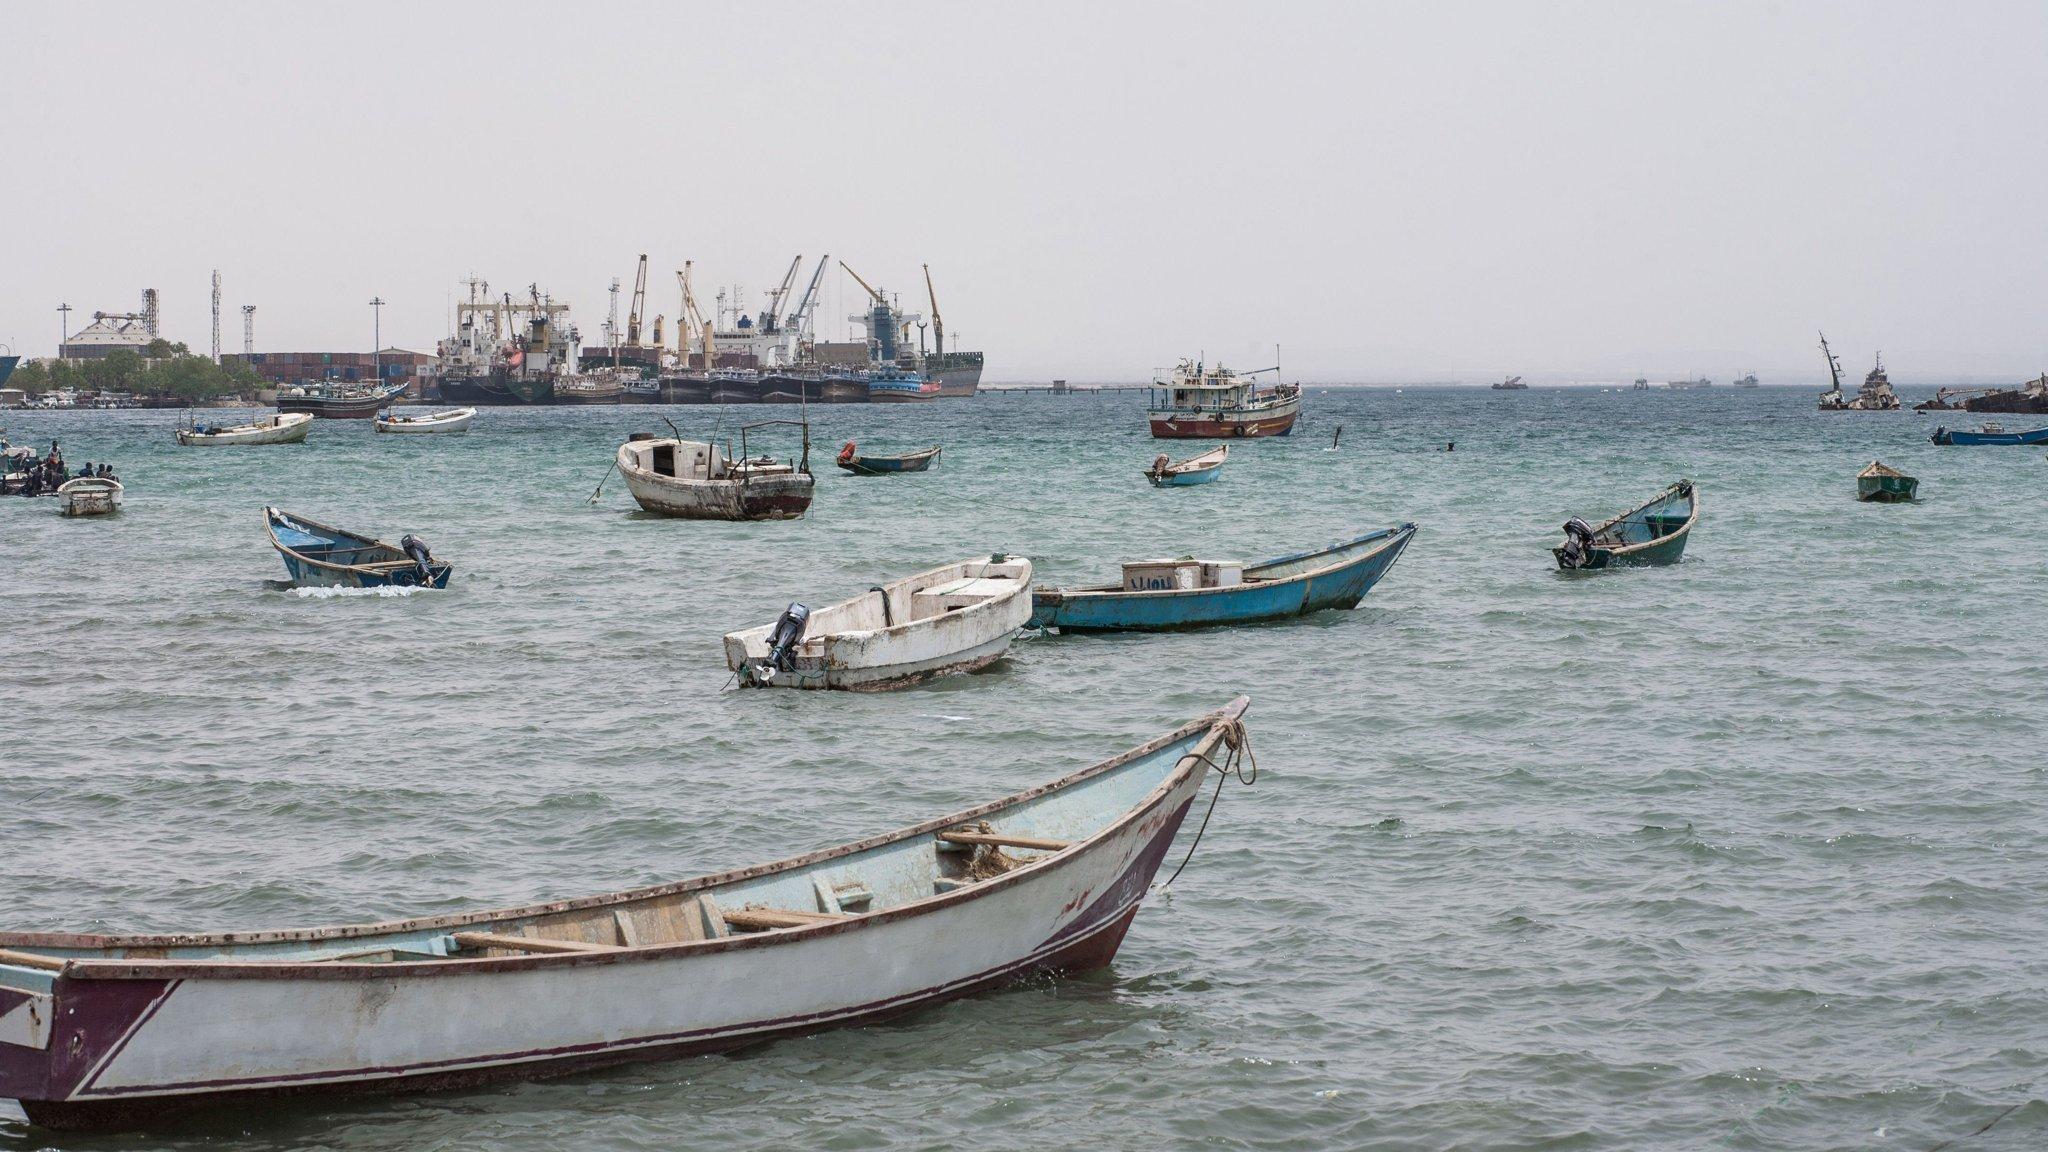 Somaliland port development highlights Horn of Africa